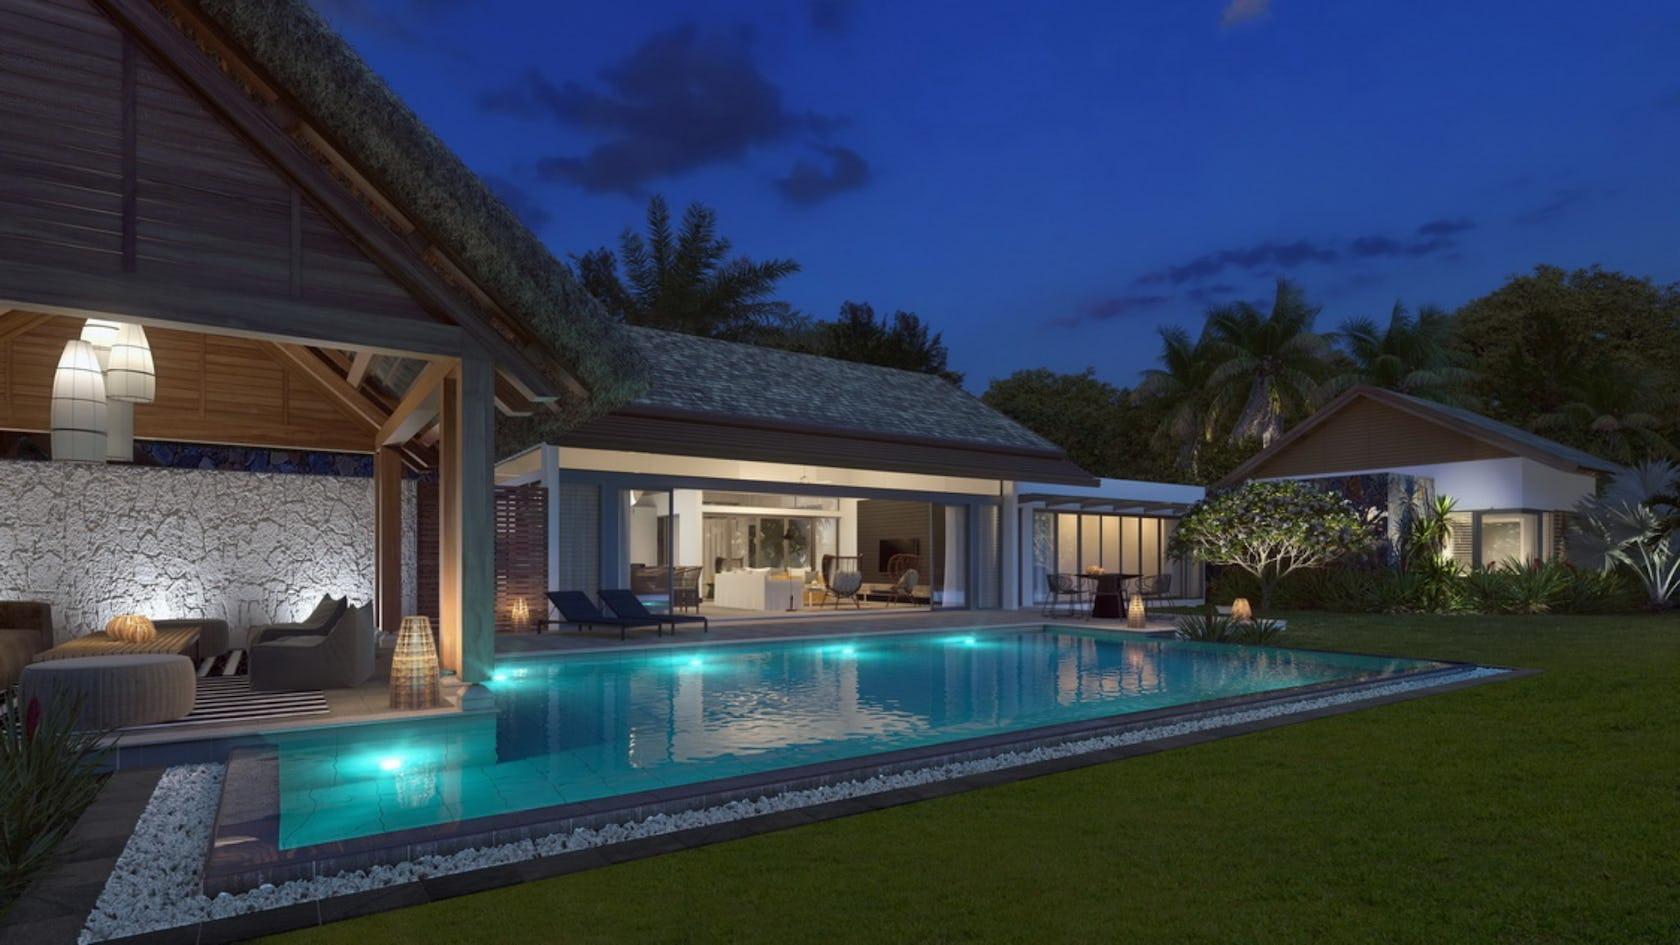 pool water building swimming pool villa housing house hotel